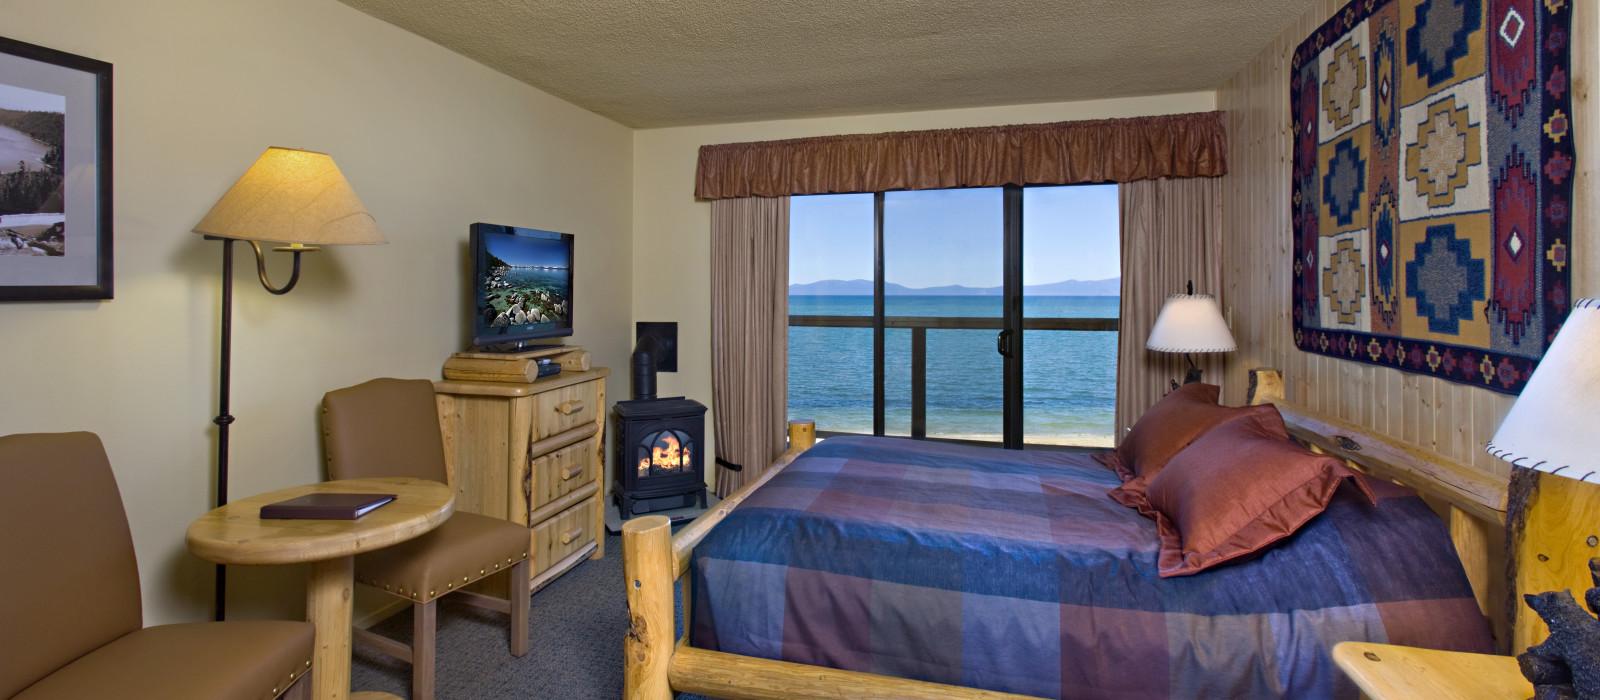 Hotel Tahoe Lake Shore Lodge USA